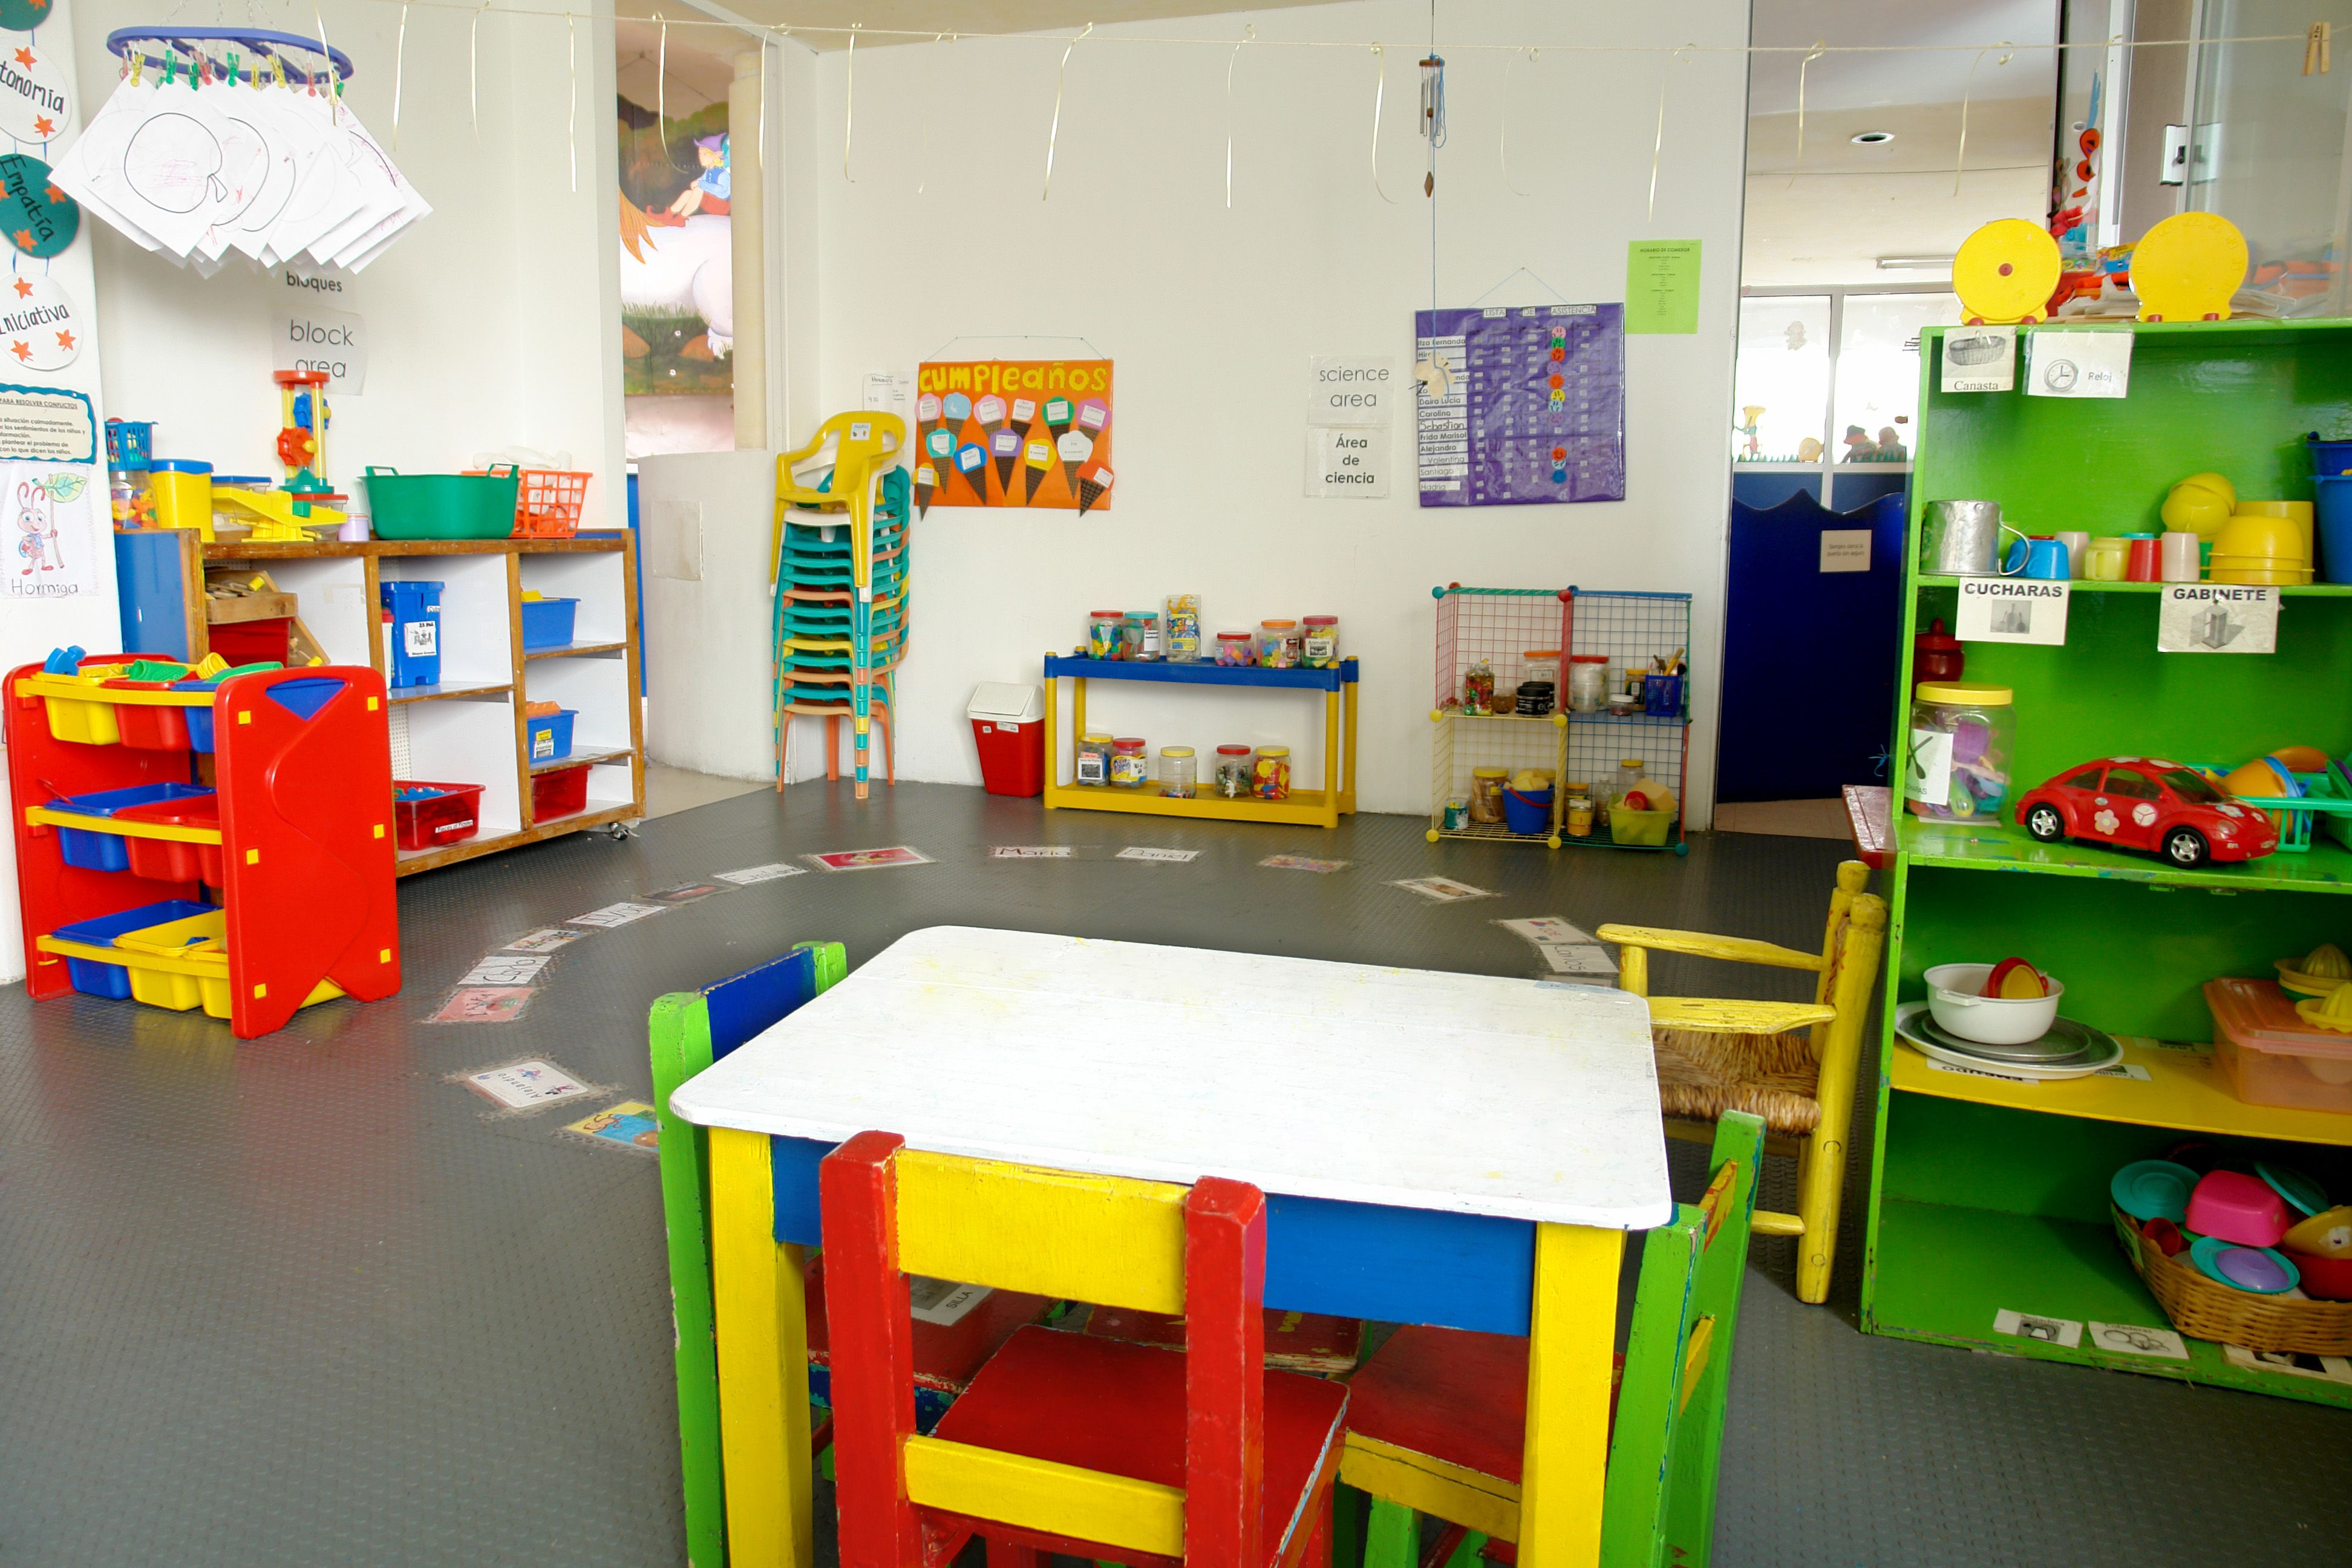 Ideas Decoraci N Aula Ideas Educativas Pinterest Aula  # Muebles Educativos